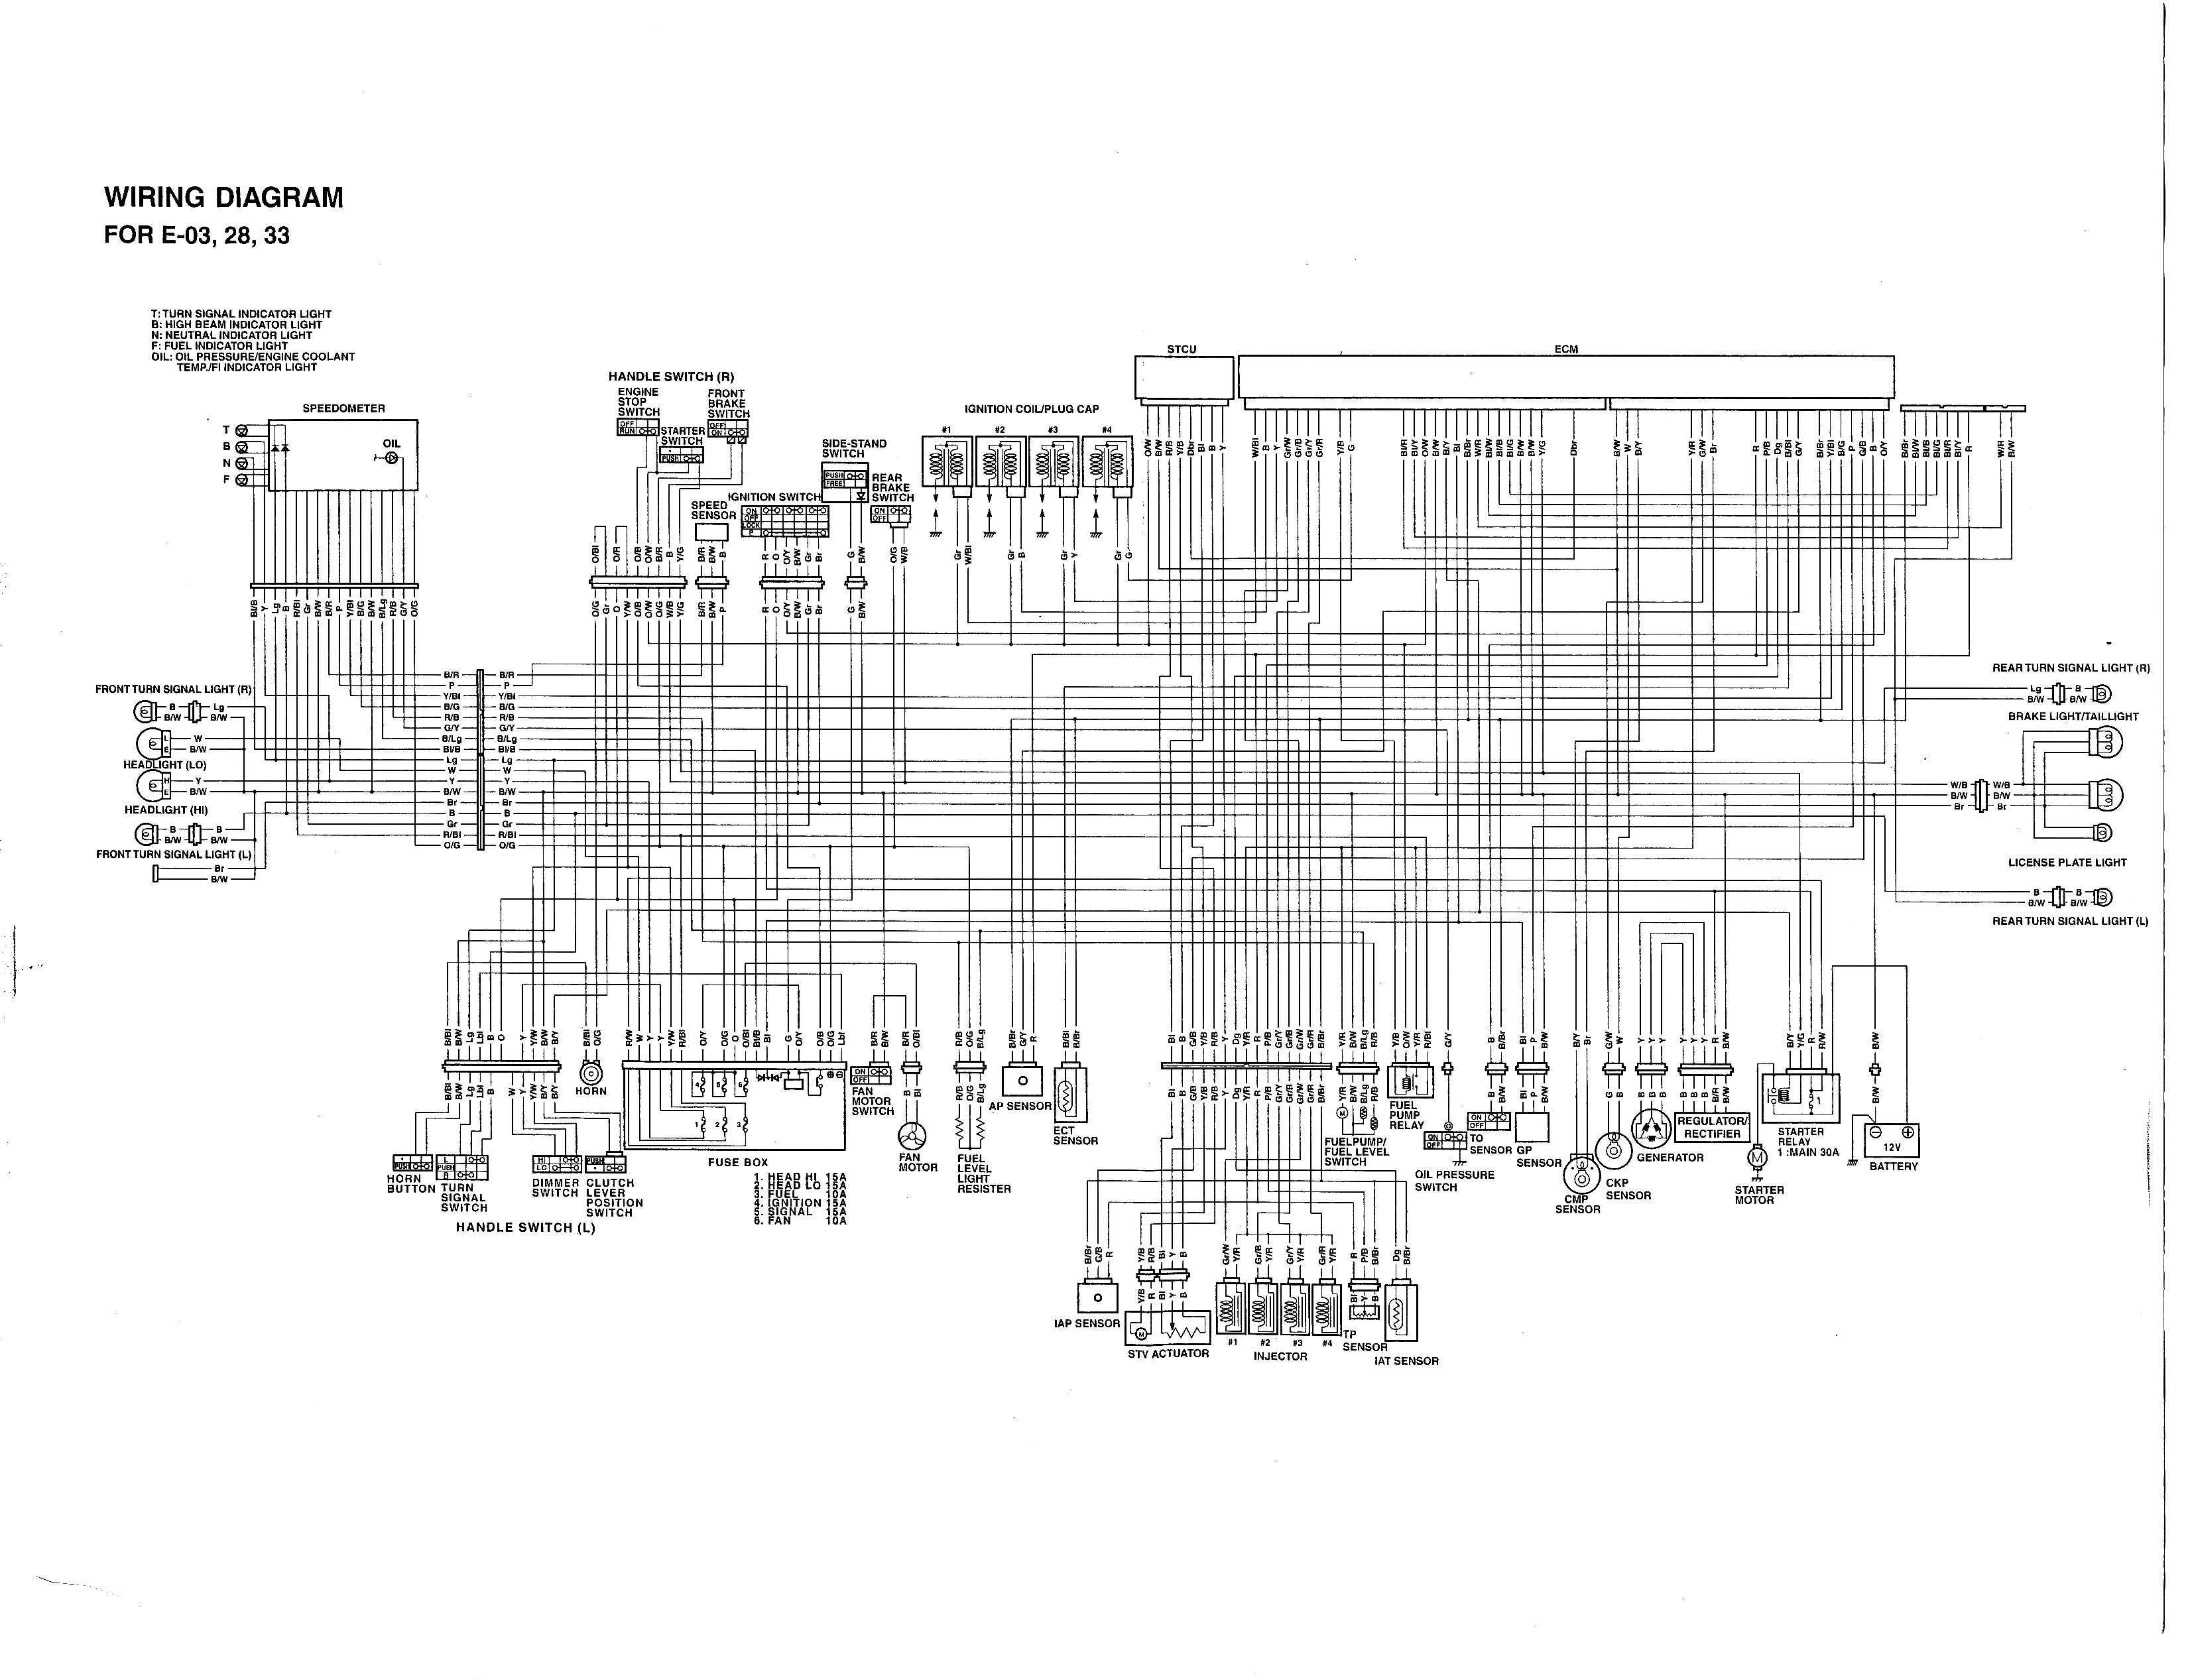 sv650 k7 wiring diagram electrical wiring diagrams rh wiringforall today Suzuki SV650 Electrical Diagram 2007 Gsxr 1000 Wiring Diagram